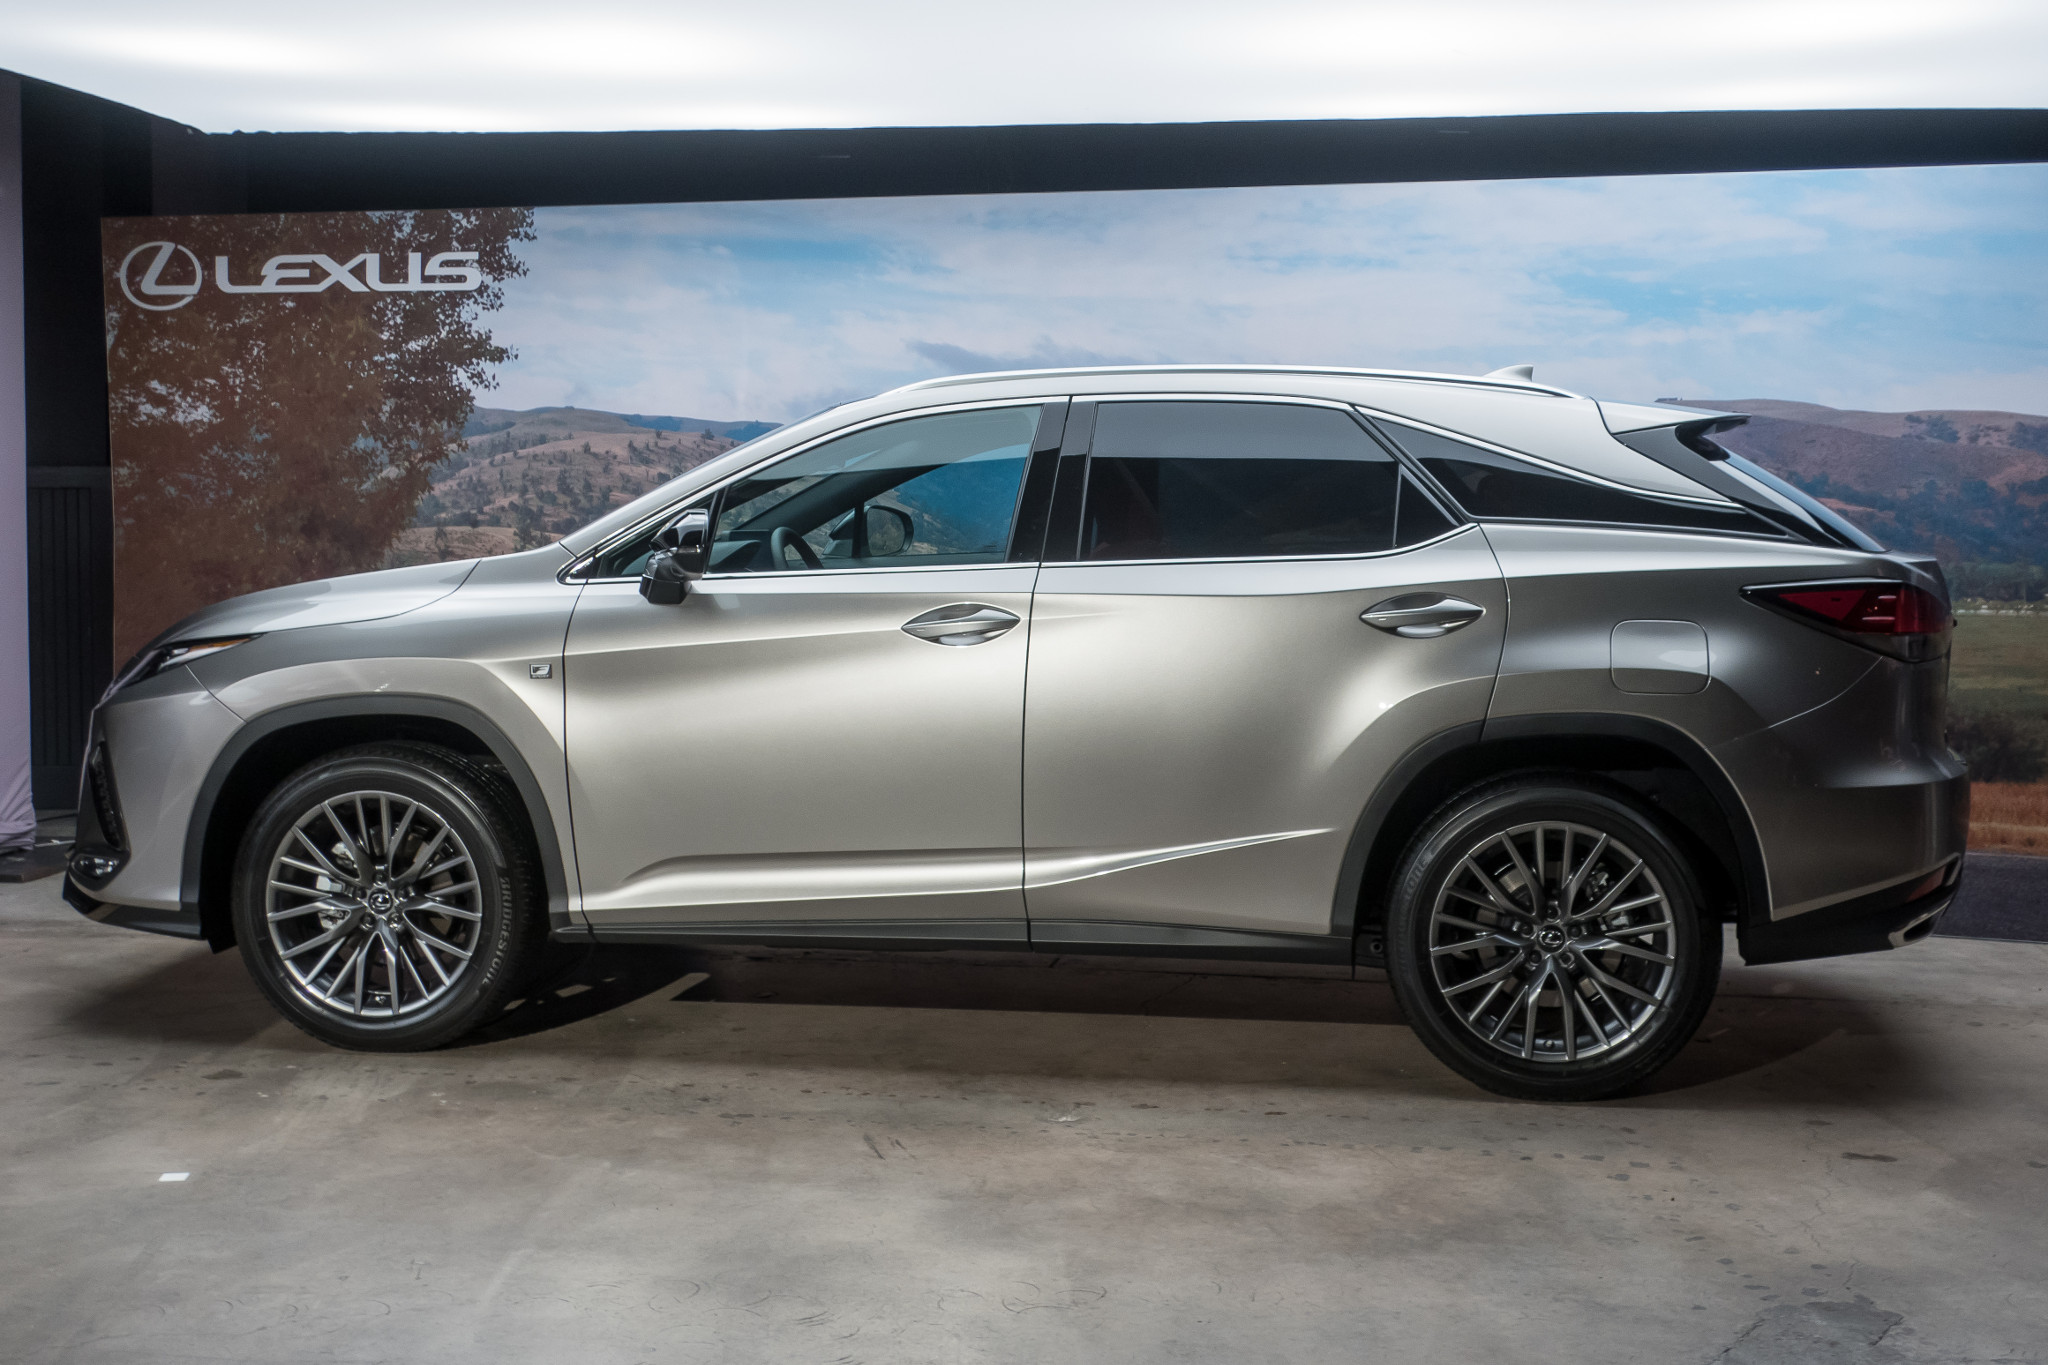 2020 Lexus RX 350 Addresses SUV's Biggest Problem, But Doesn